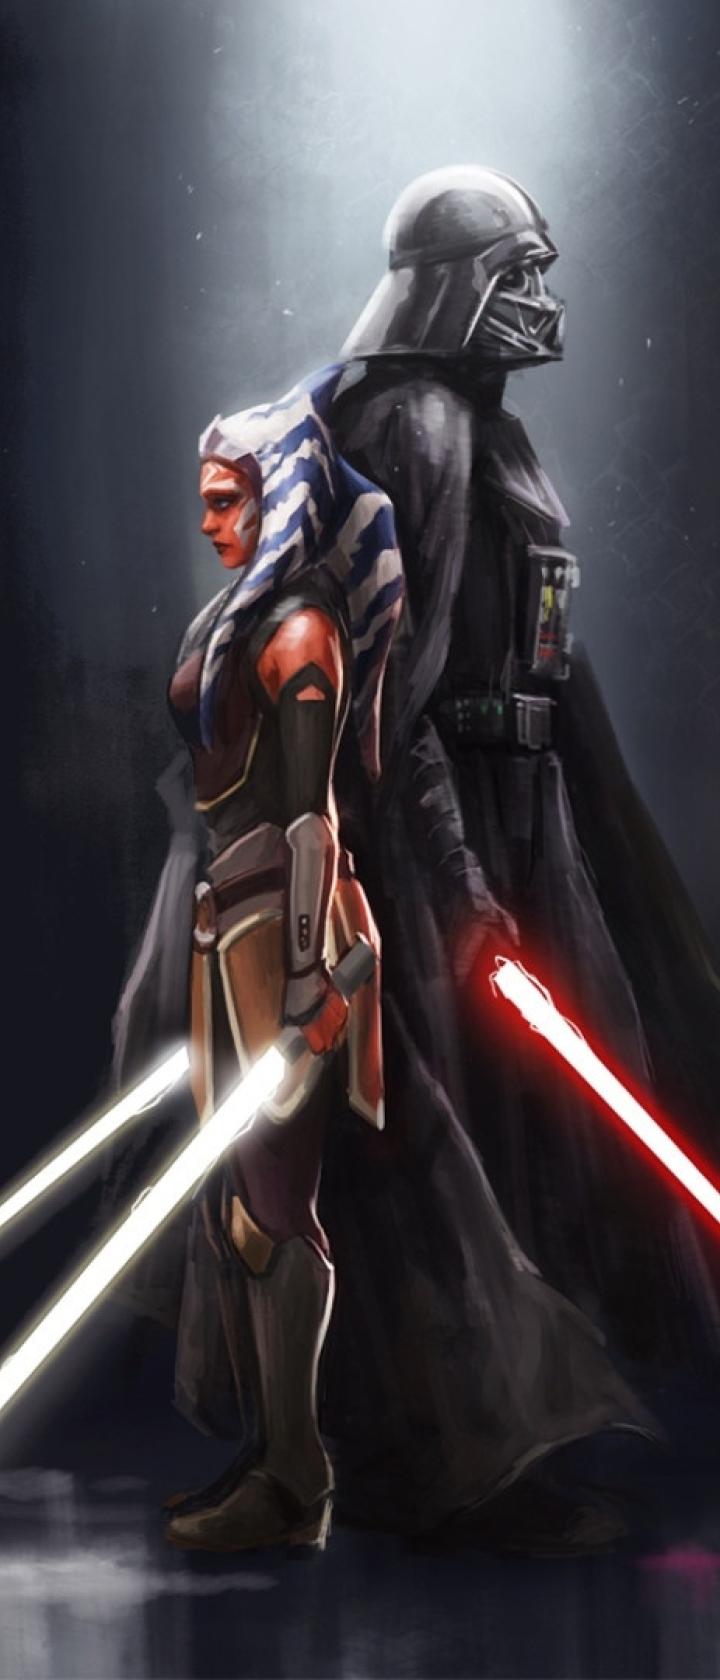 720x1680 Ahsoka Tano x Darth Vader 720x1680 Resolution ...